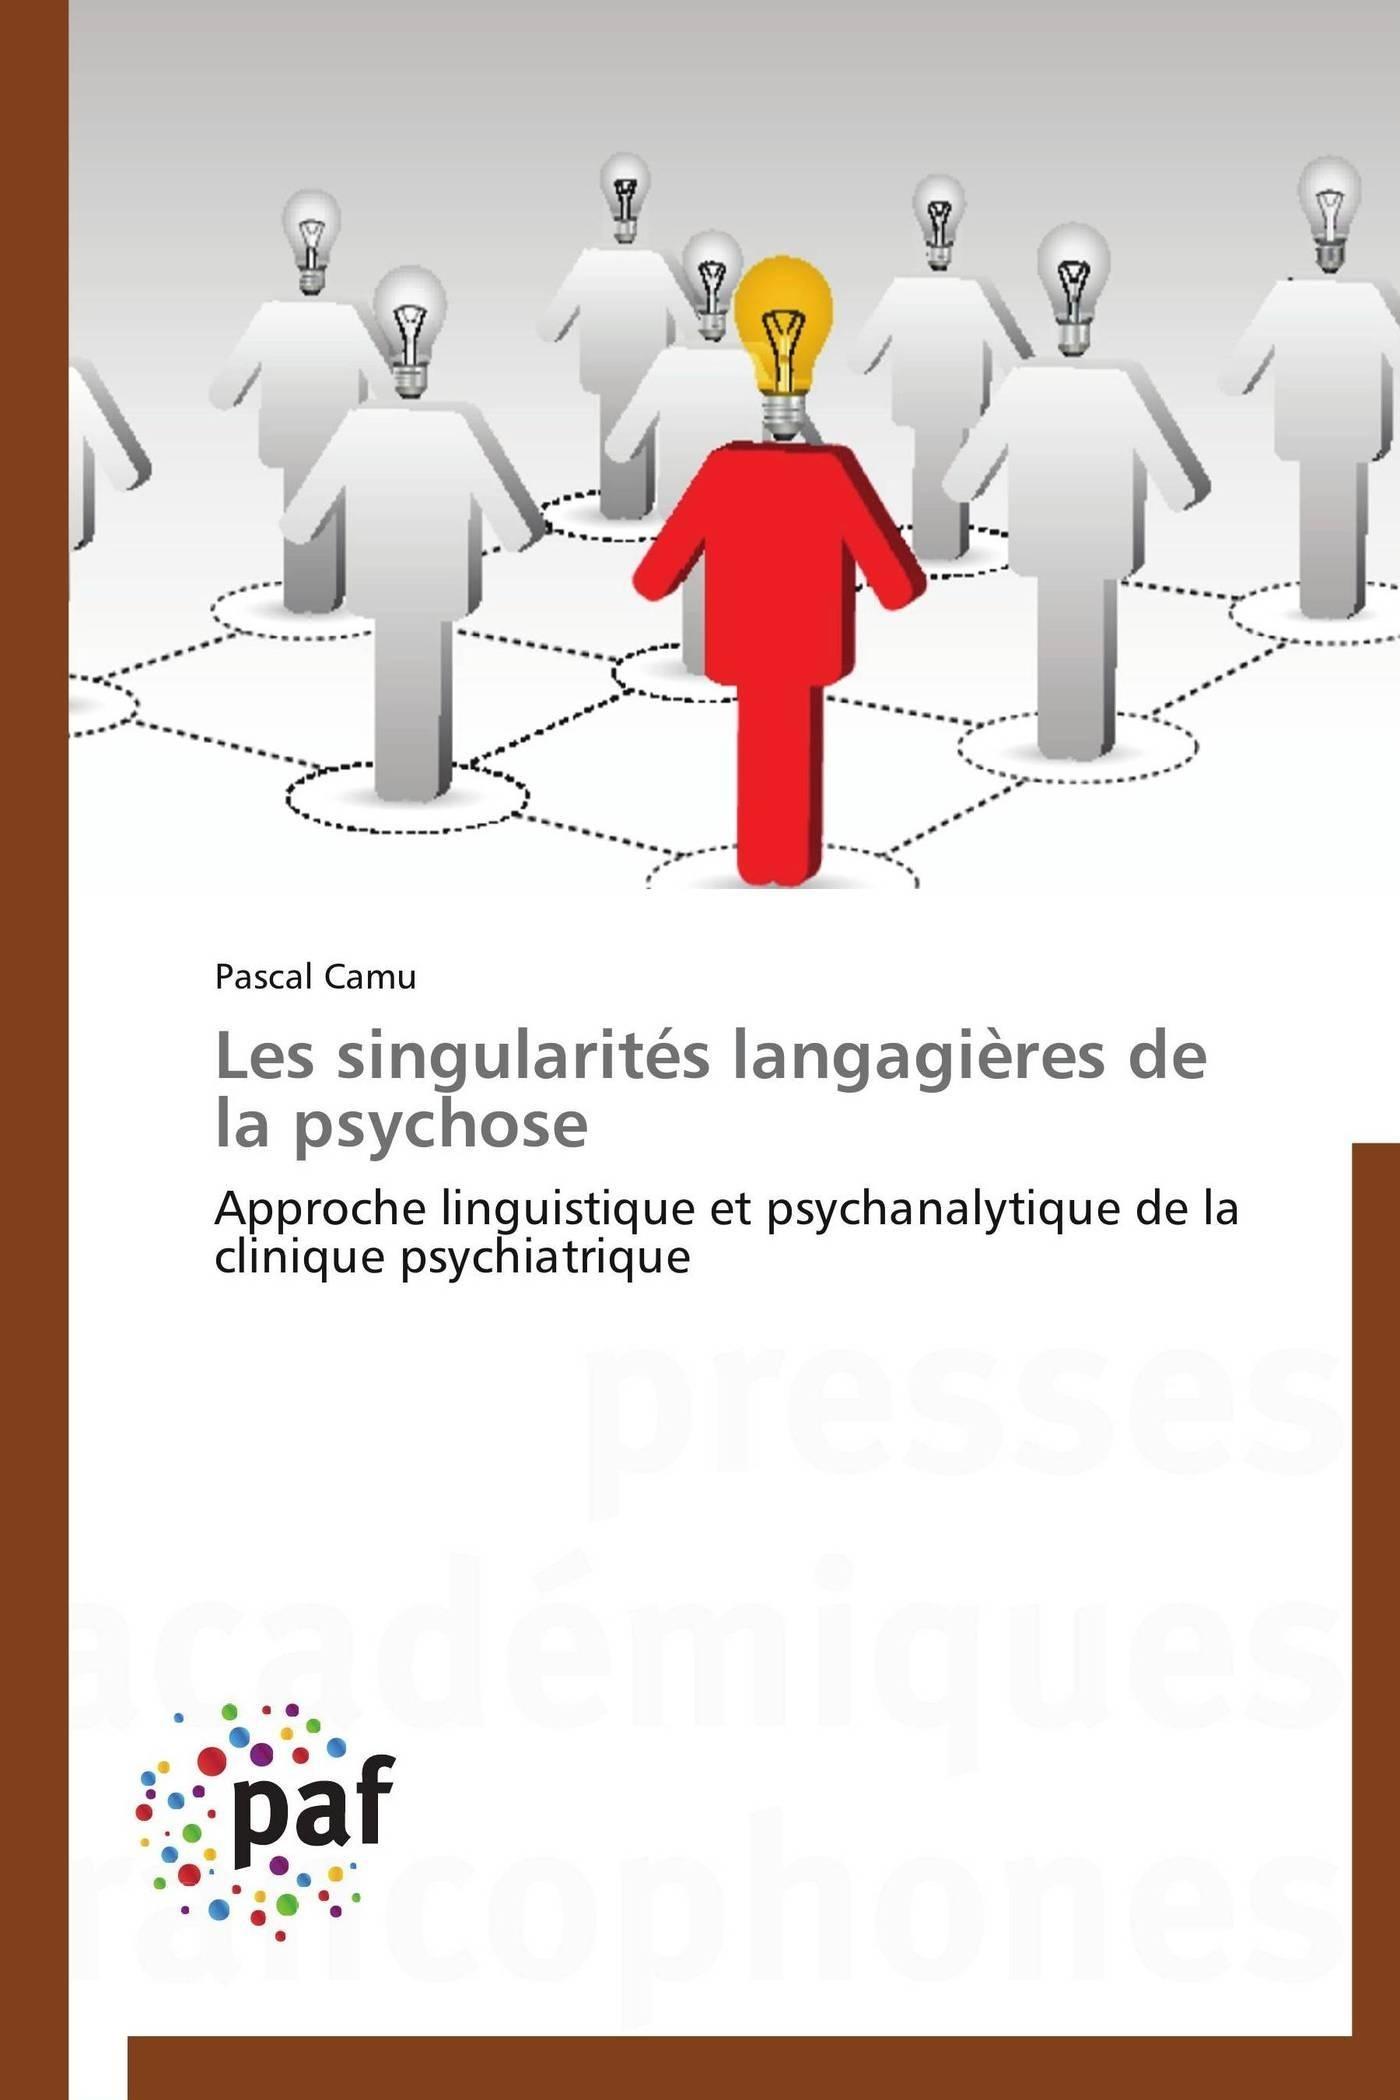 LES SINGULARITES LANGAGIERES DE LA PSYCHOSE